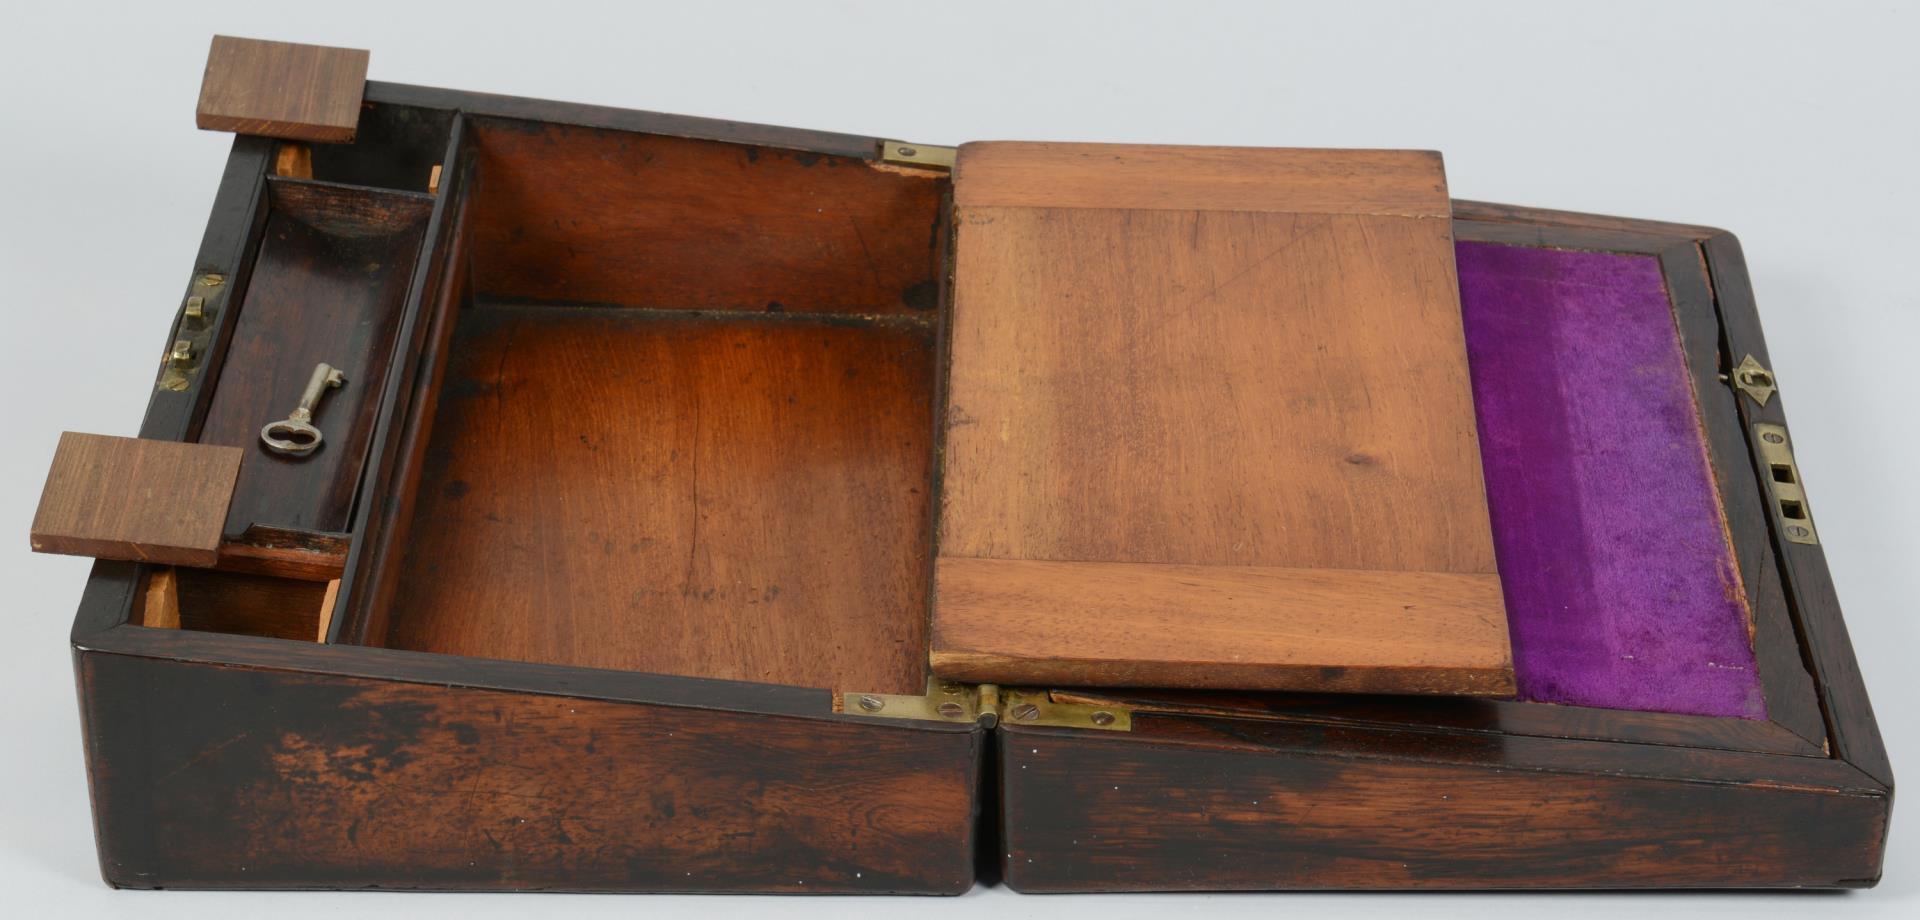 Lot 835: Lap Desk & 10 Assd. small items